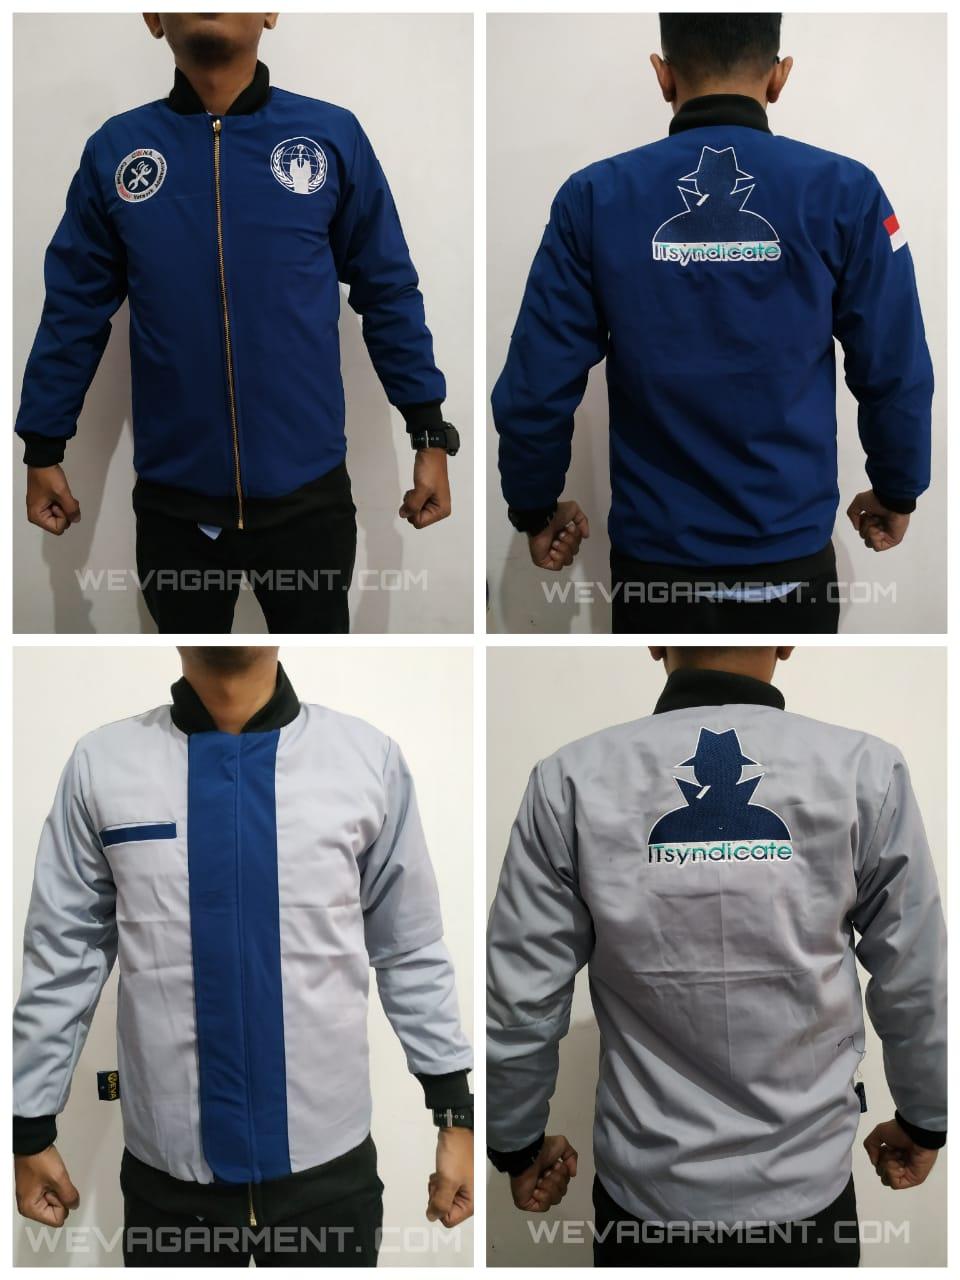 Contoh Desain Jaket – Weva Garment Indonesia | Konveksi Surabaya